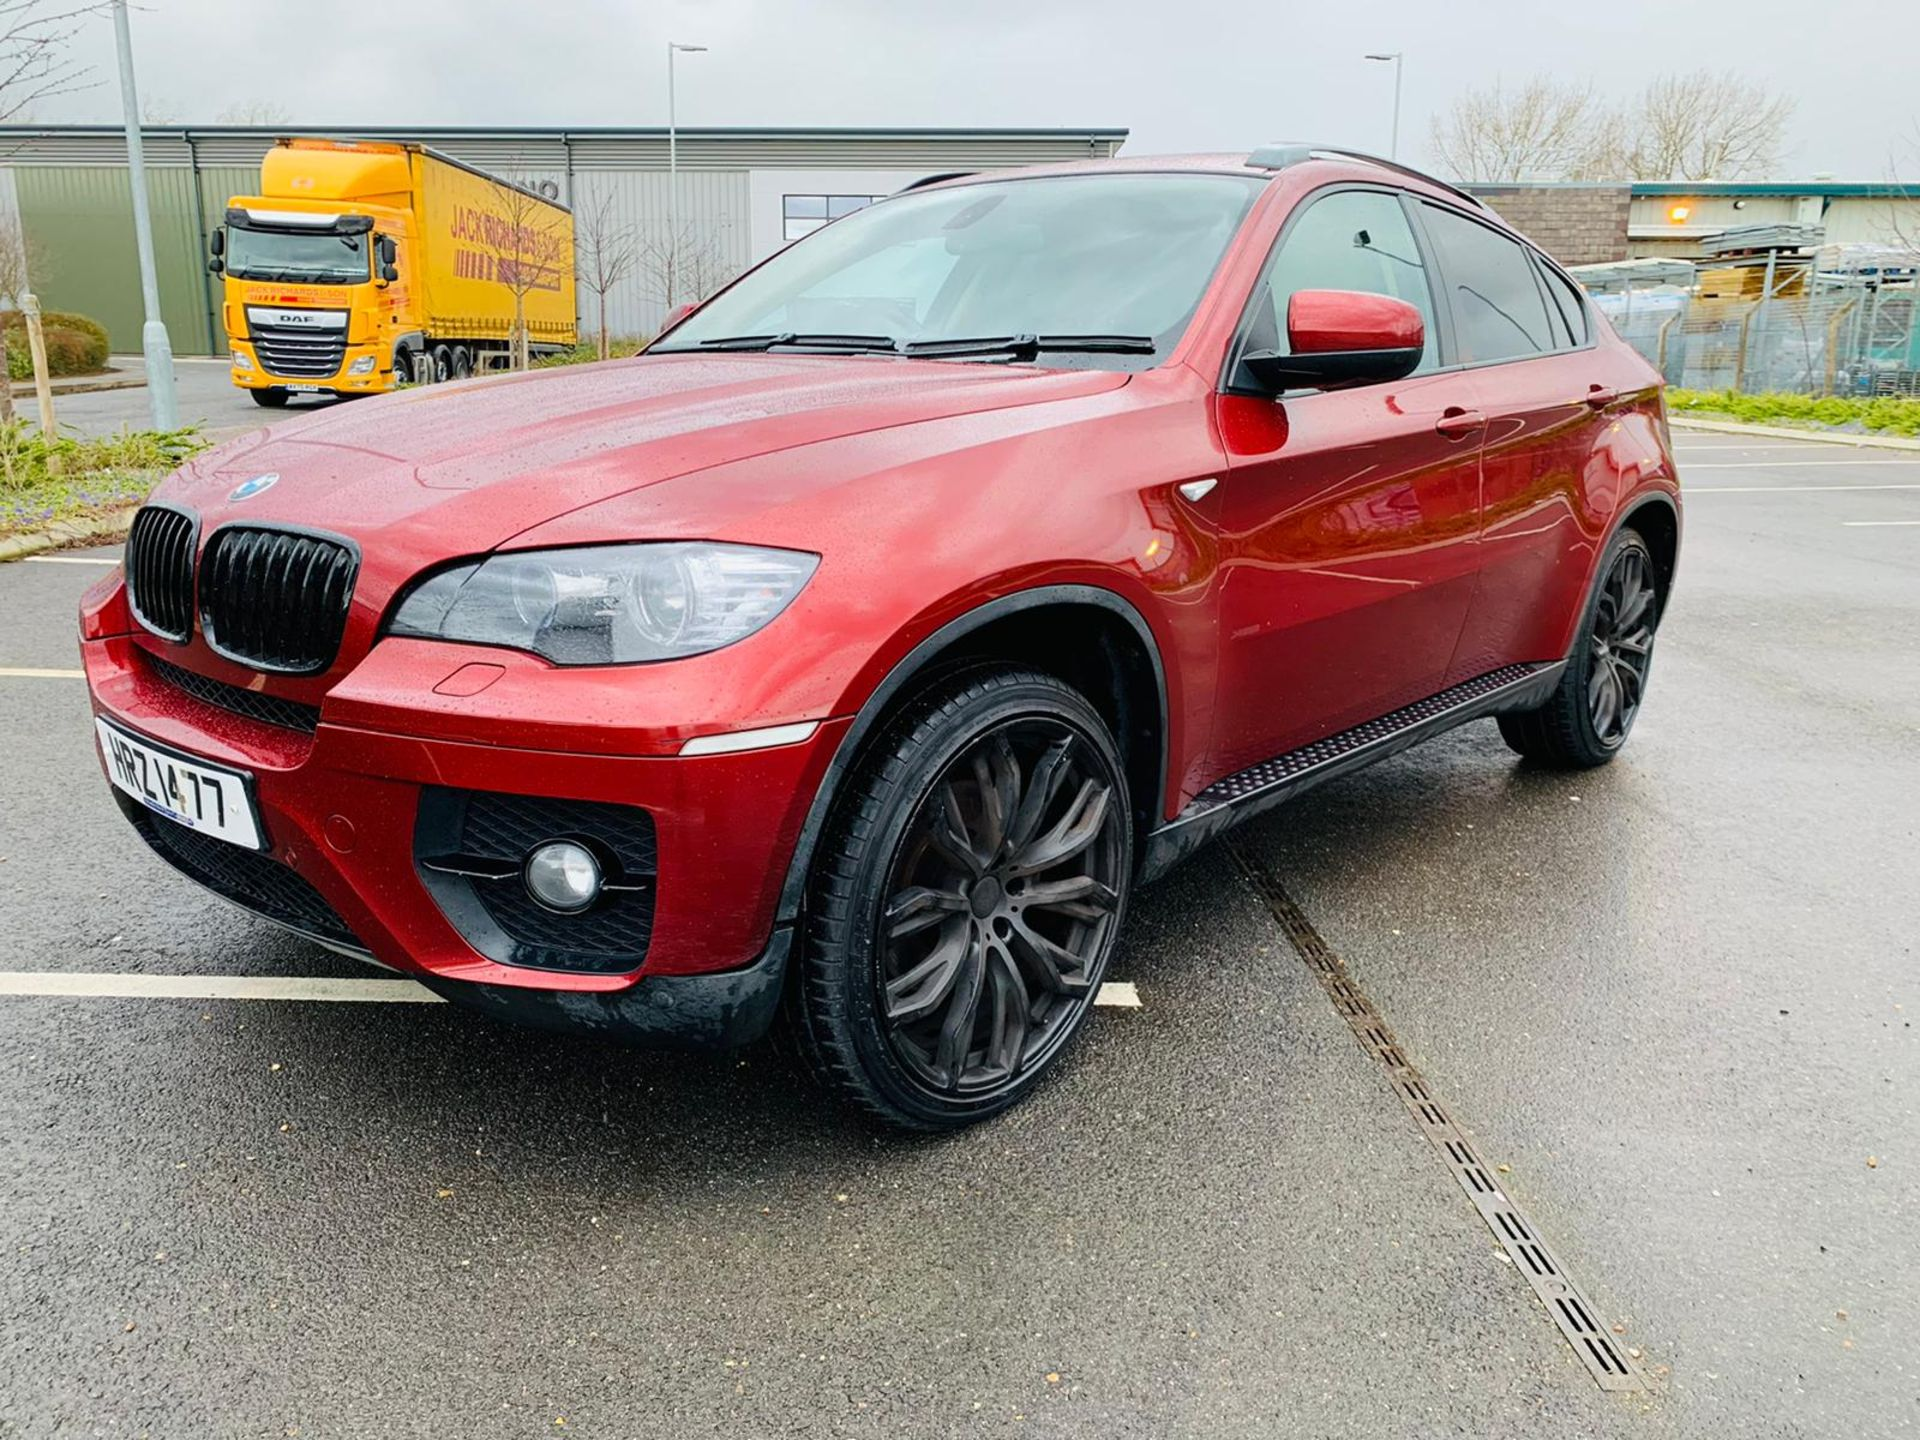 Reseve Met - BMW X6 xDrive 3.0d Auto - 2014 Reg - Leather Interior -Parking Sensors - Reversing Cam